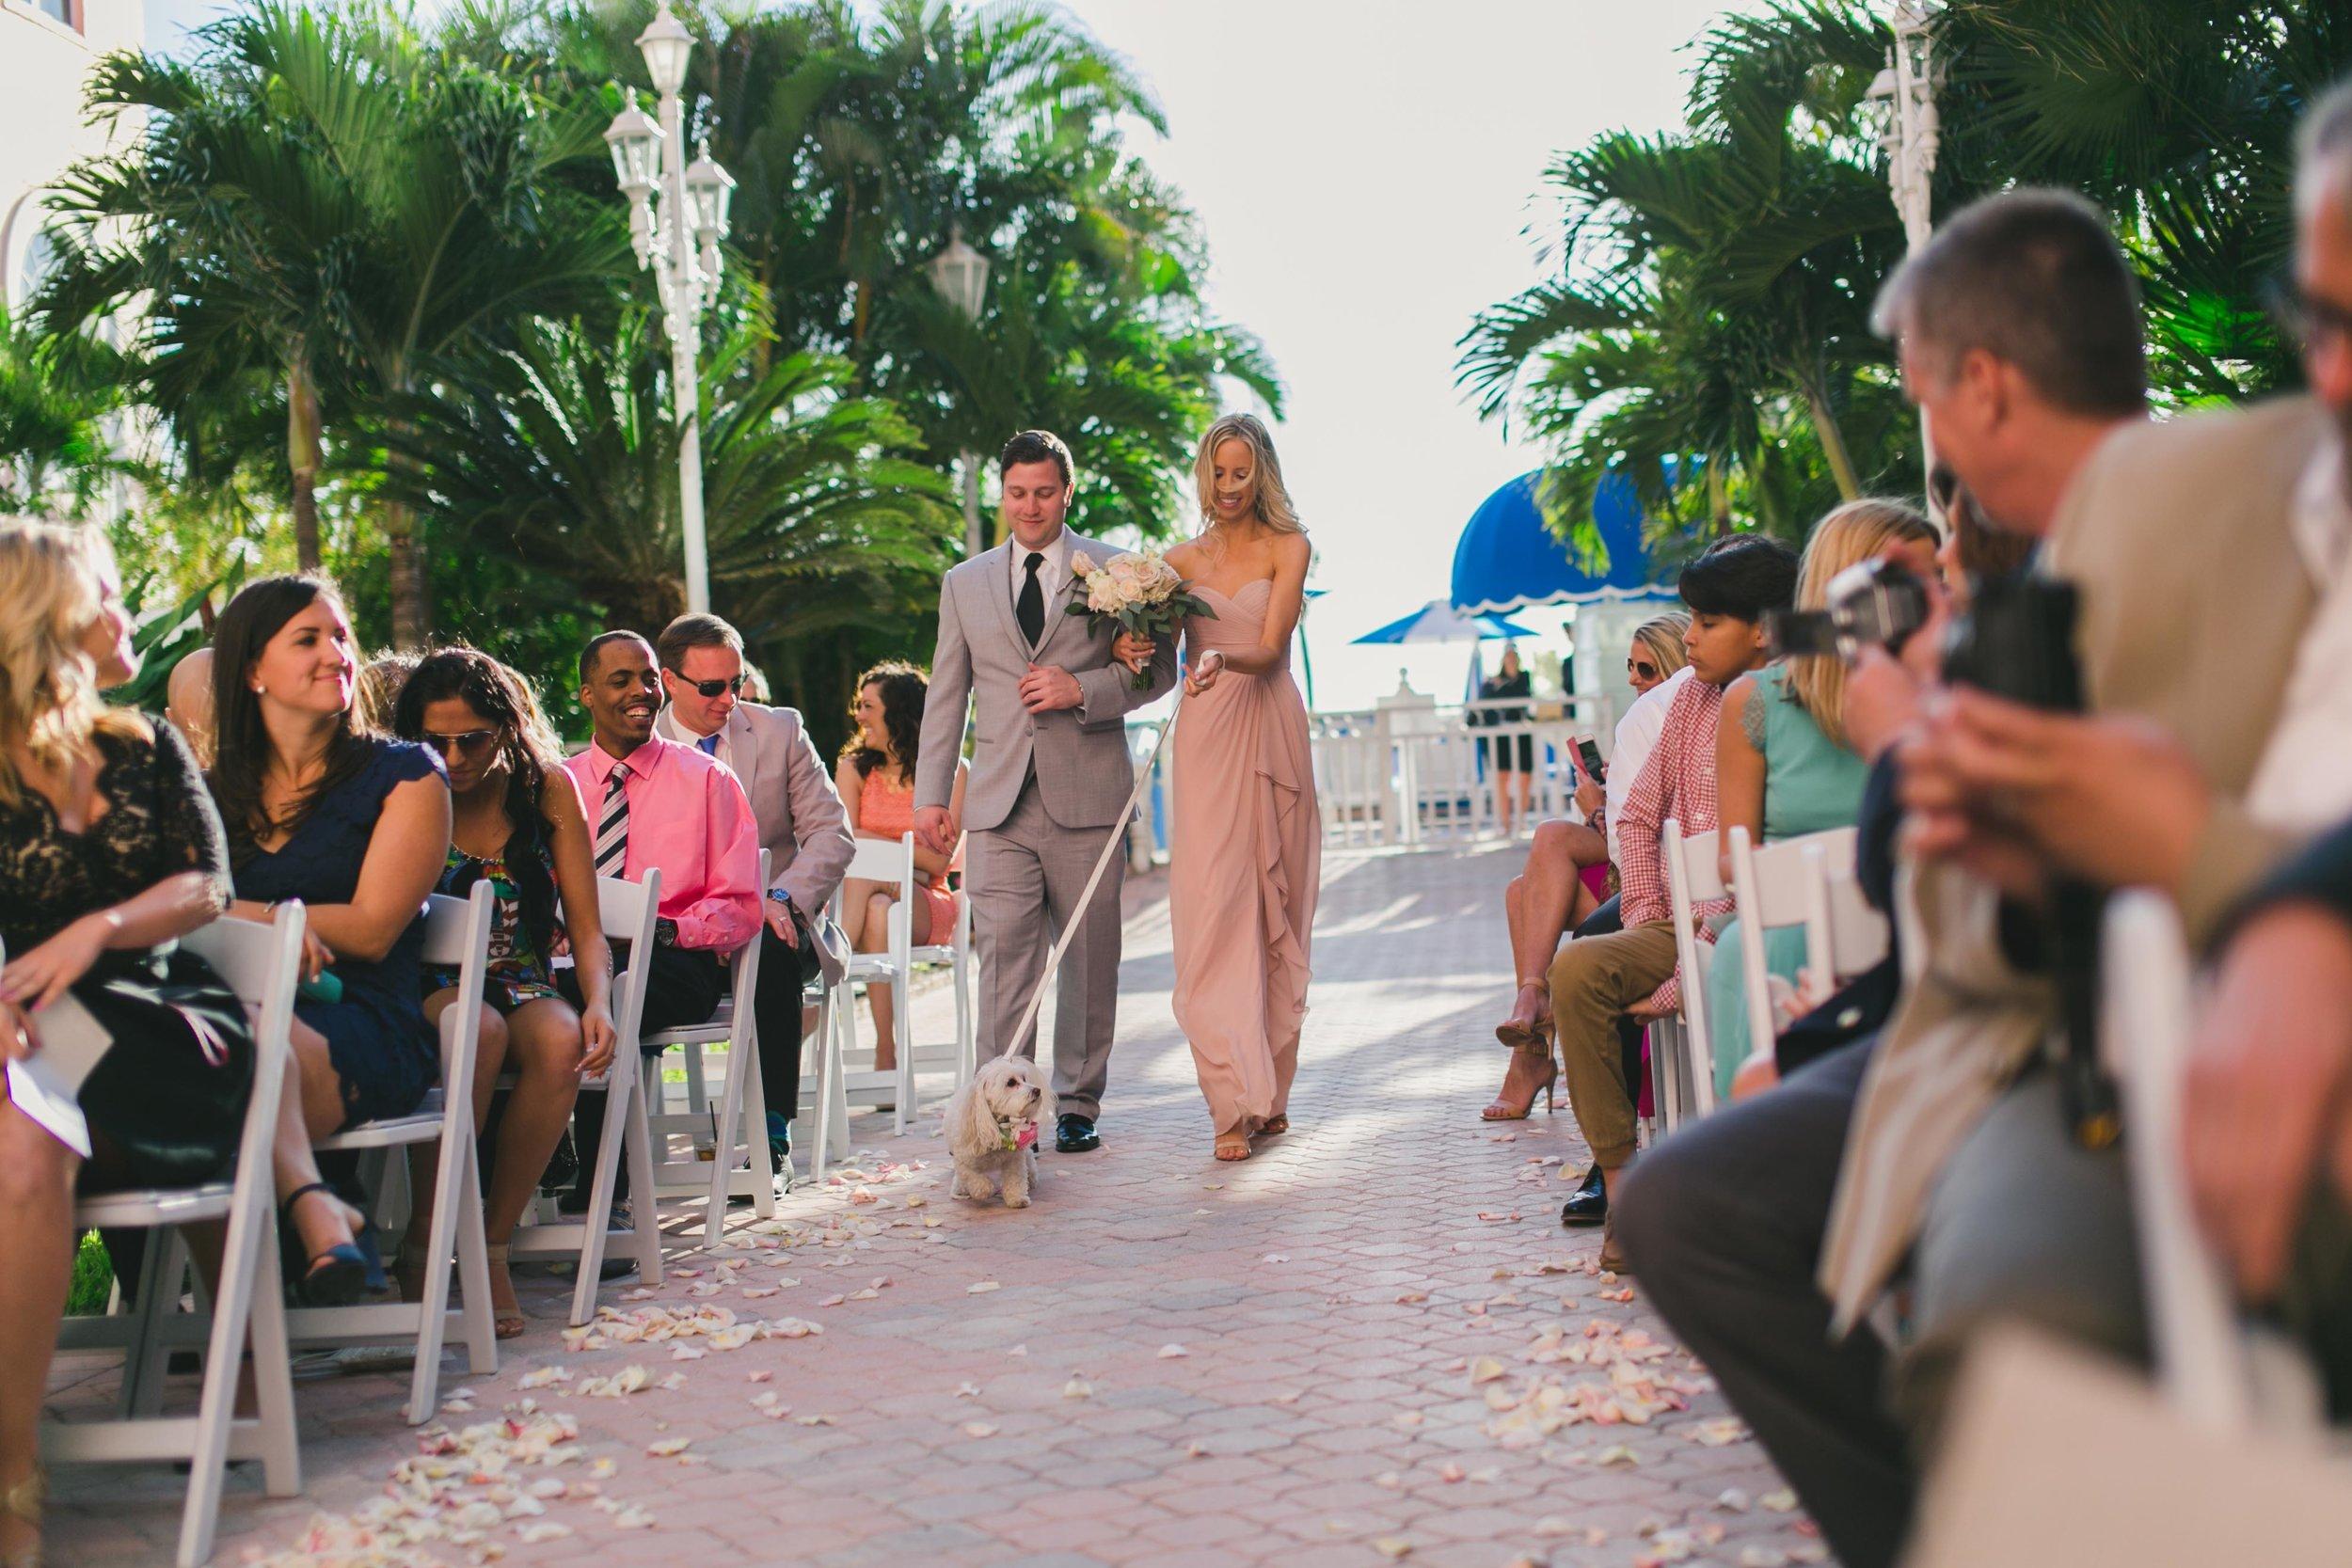 dog_in_wedding_st_pete